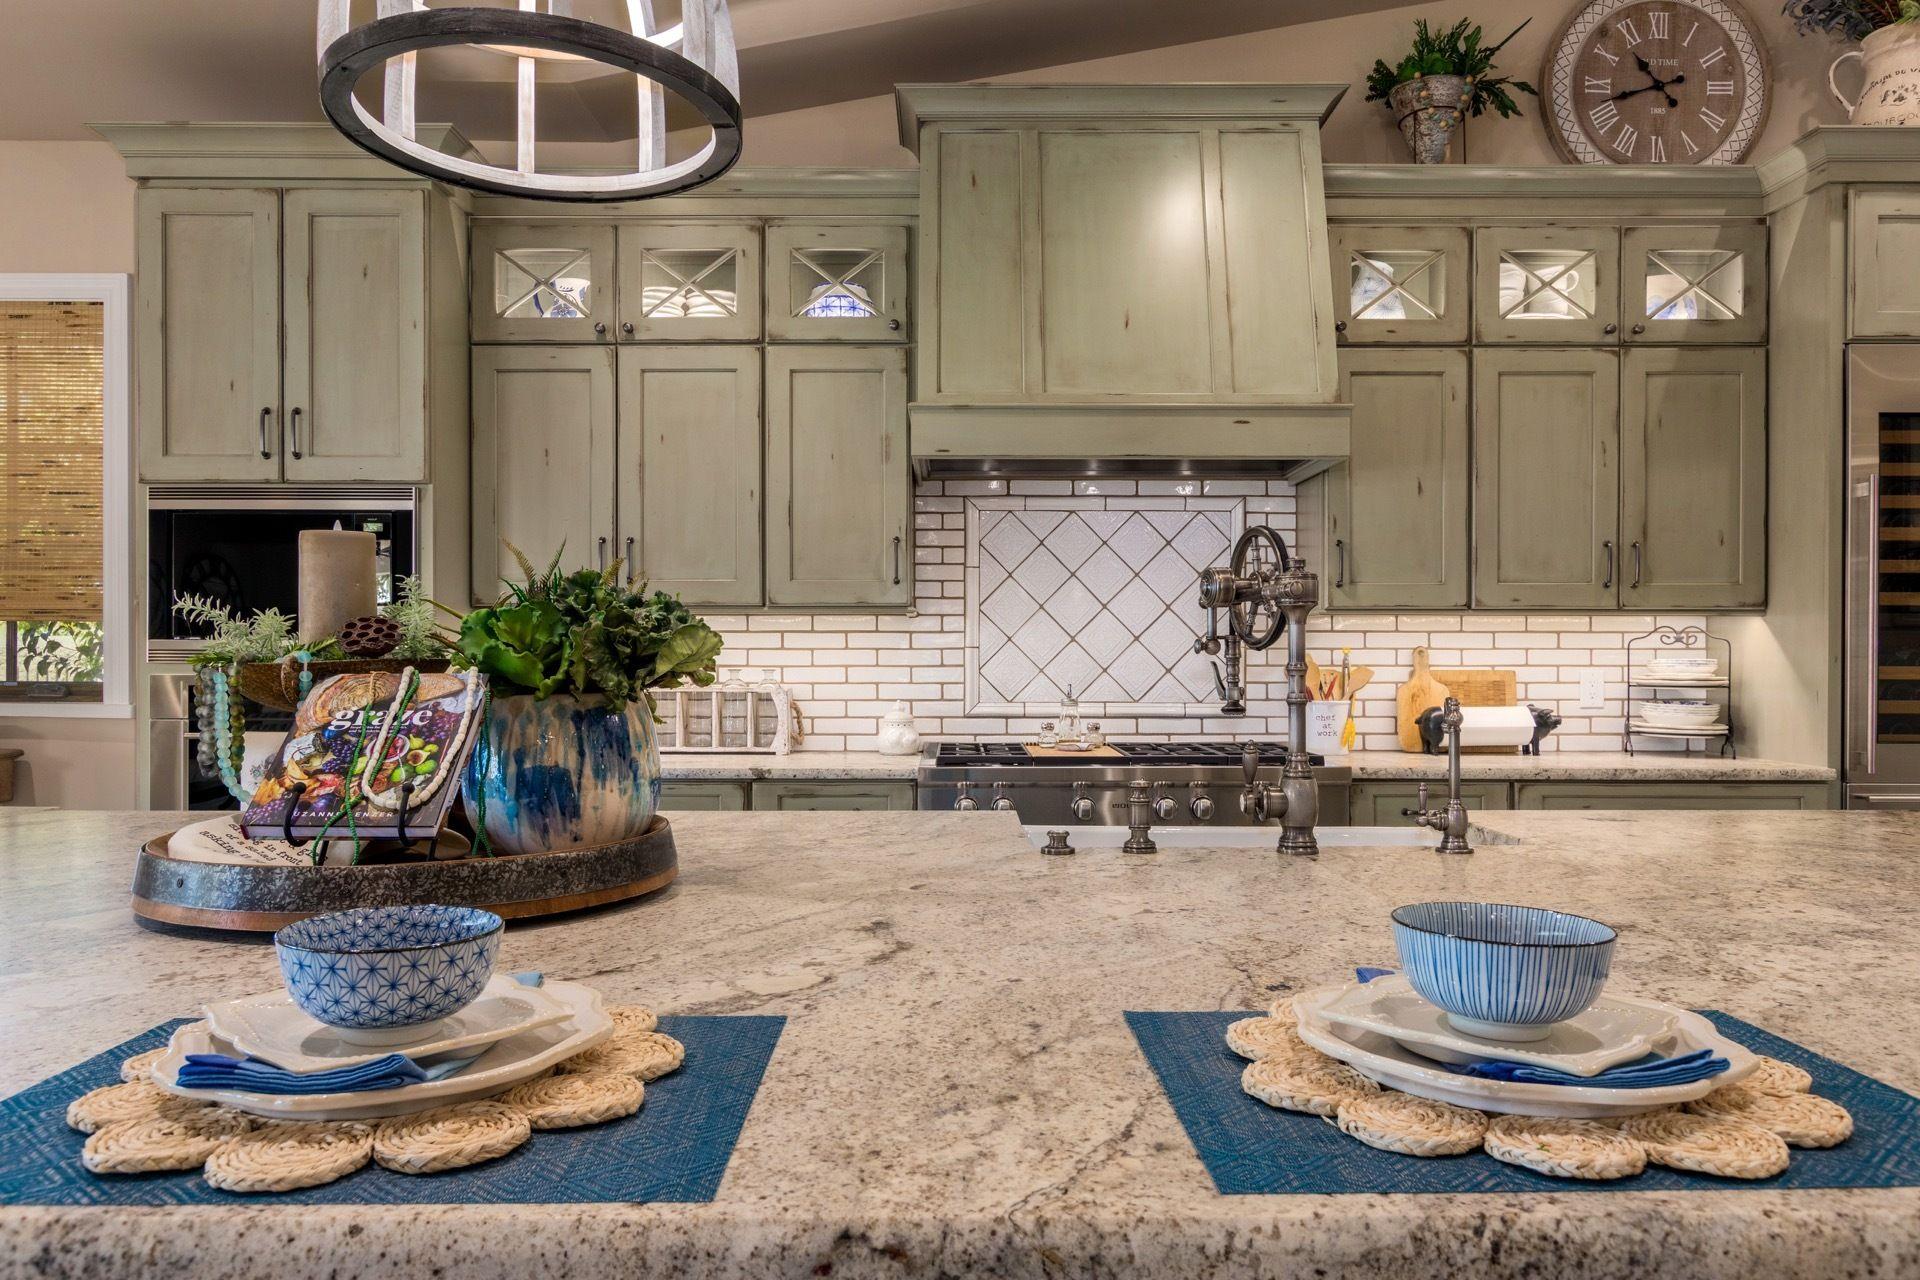 Patrick Acres Kitchens By Good Guys Kitchen Remodel Kitchen Remodeling Companies Handcrafted Tile Backsplash